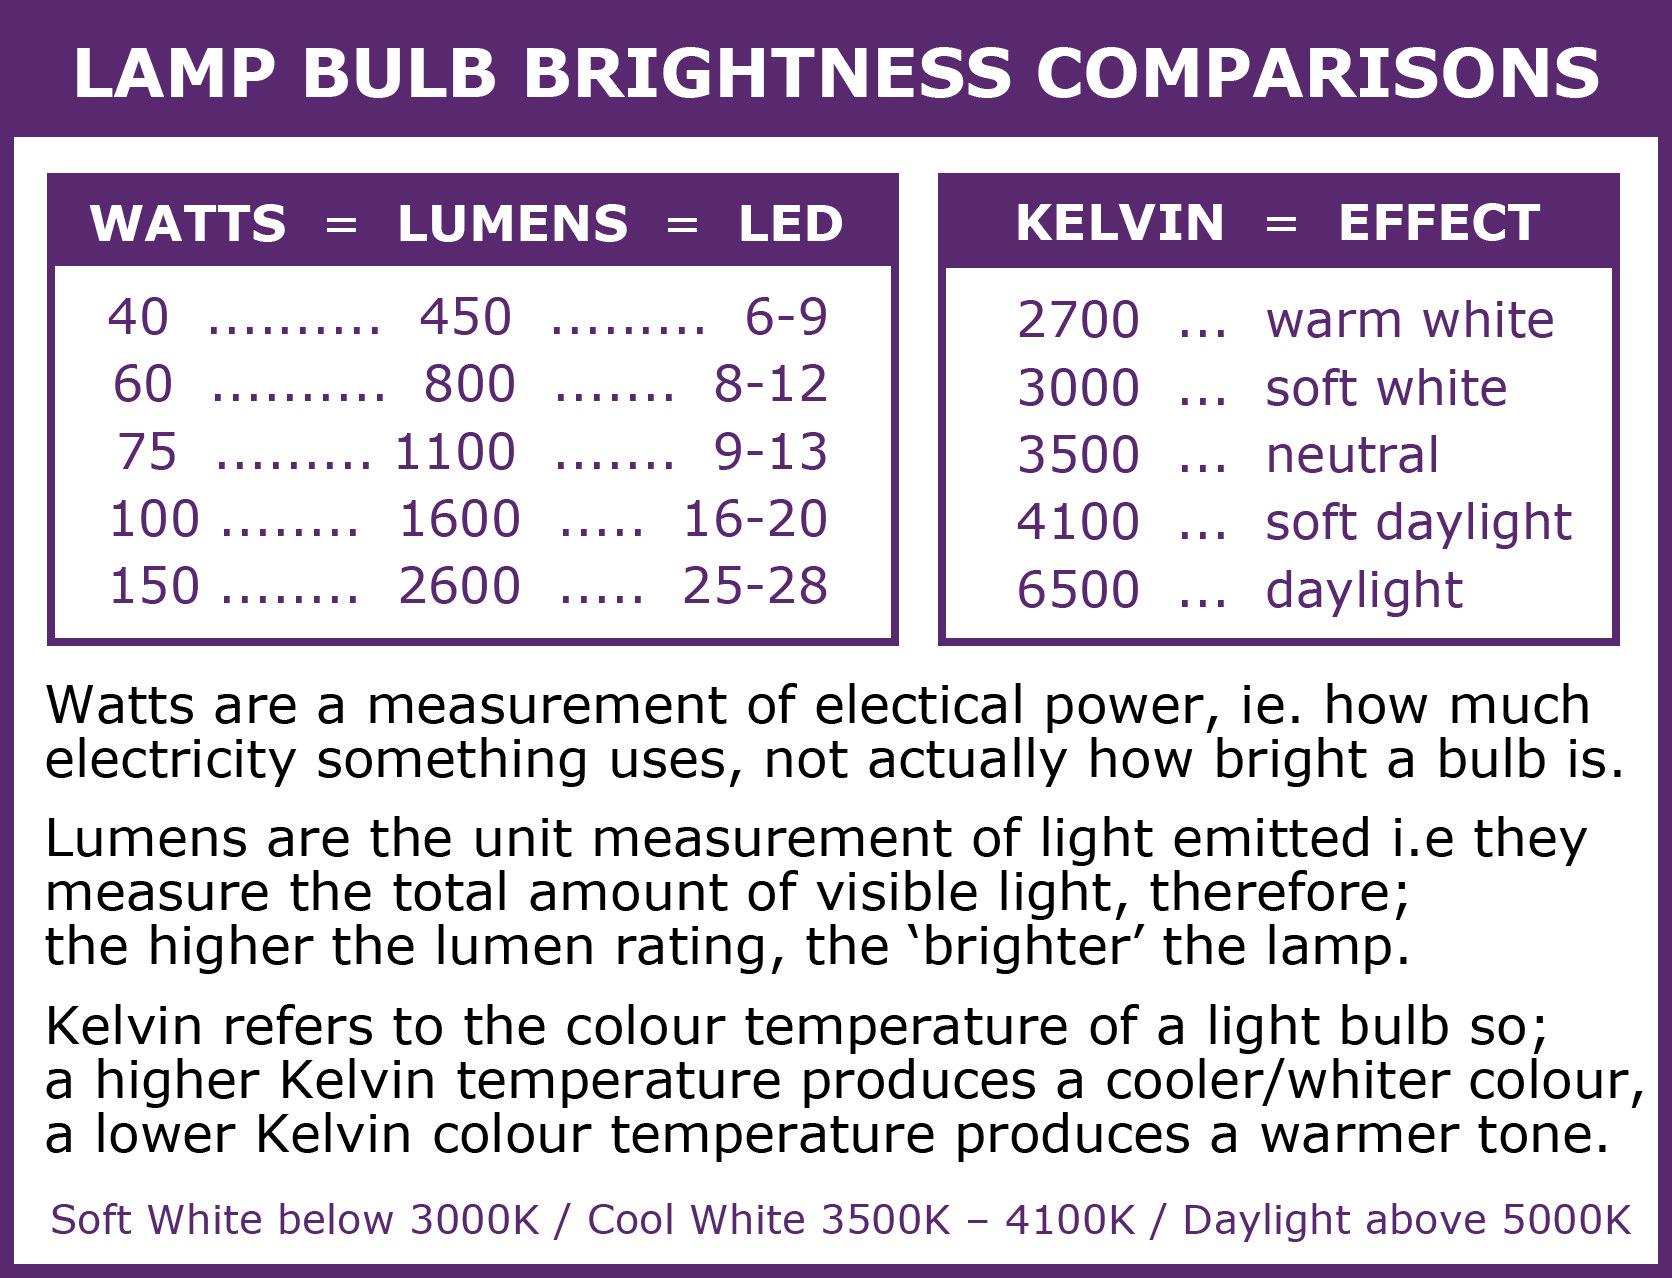 bulb-brightness-comparison-info